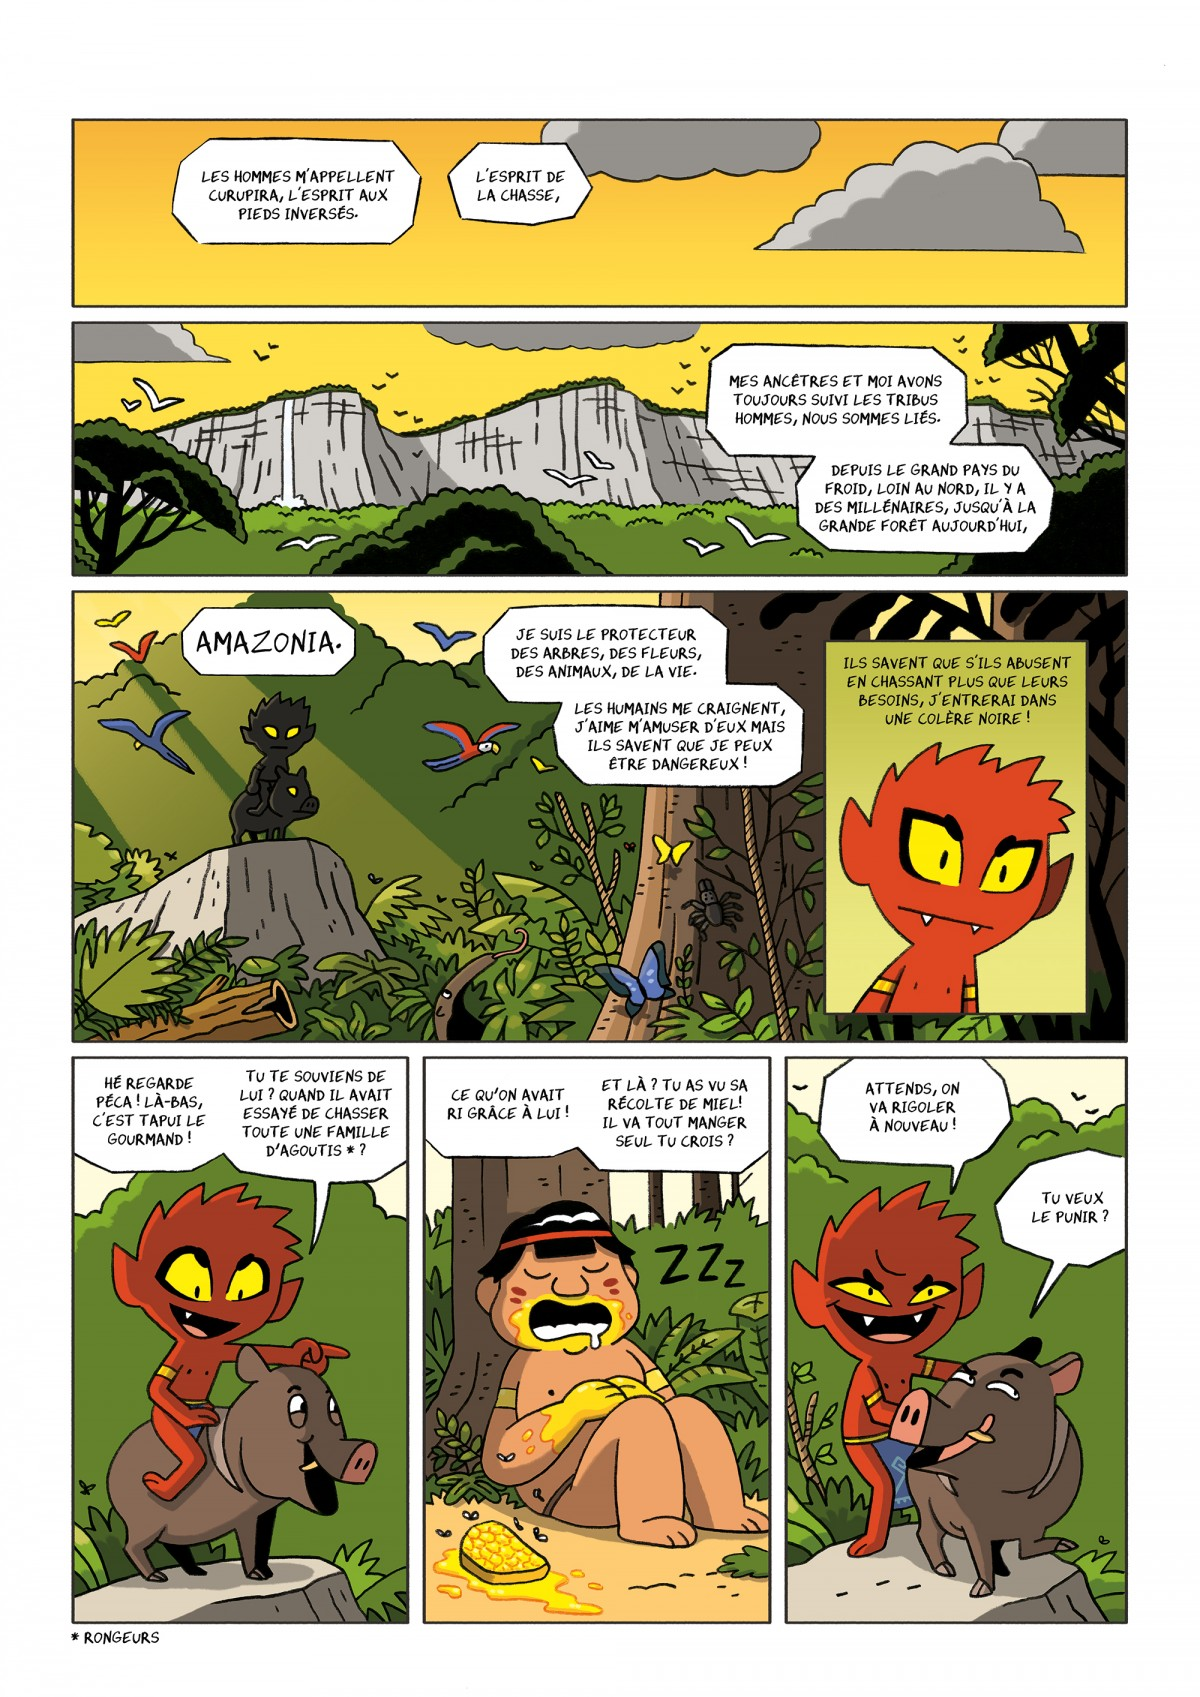 Mathieu Demore, Illustration jeunesse et Bande-dessinée Curupira